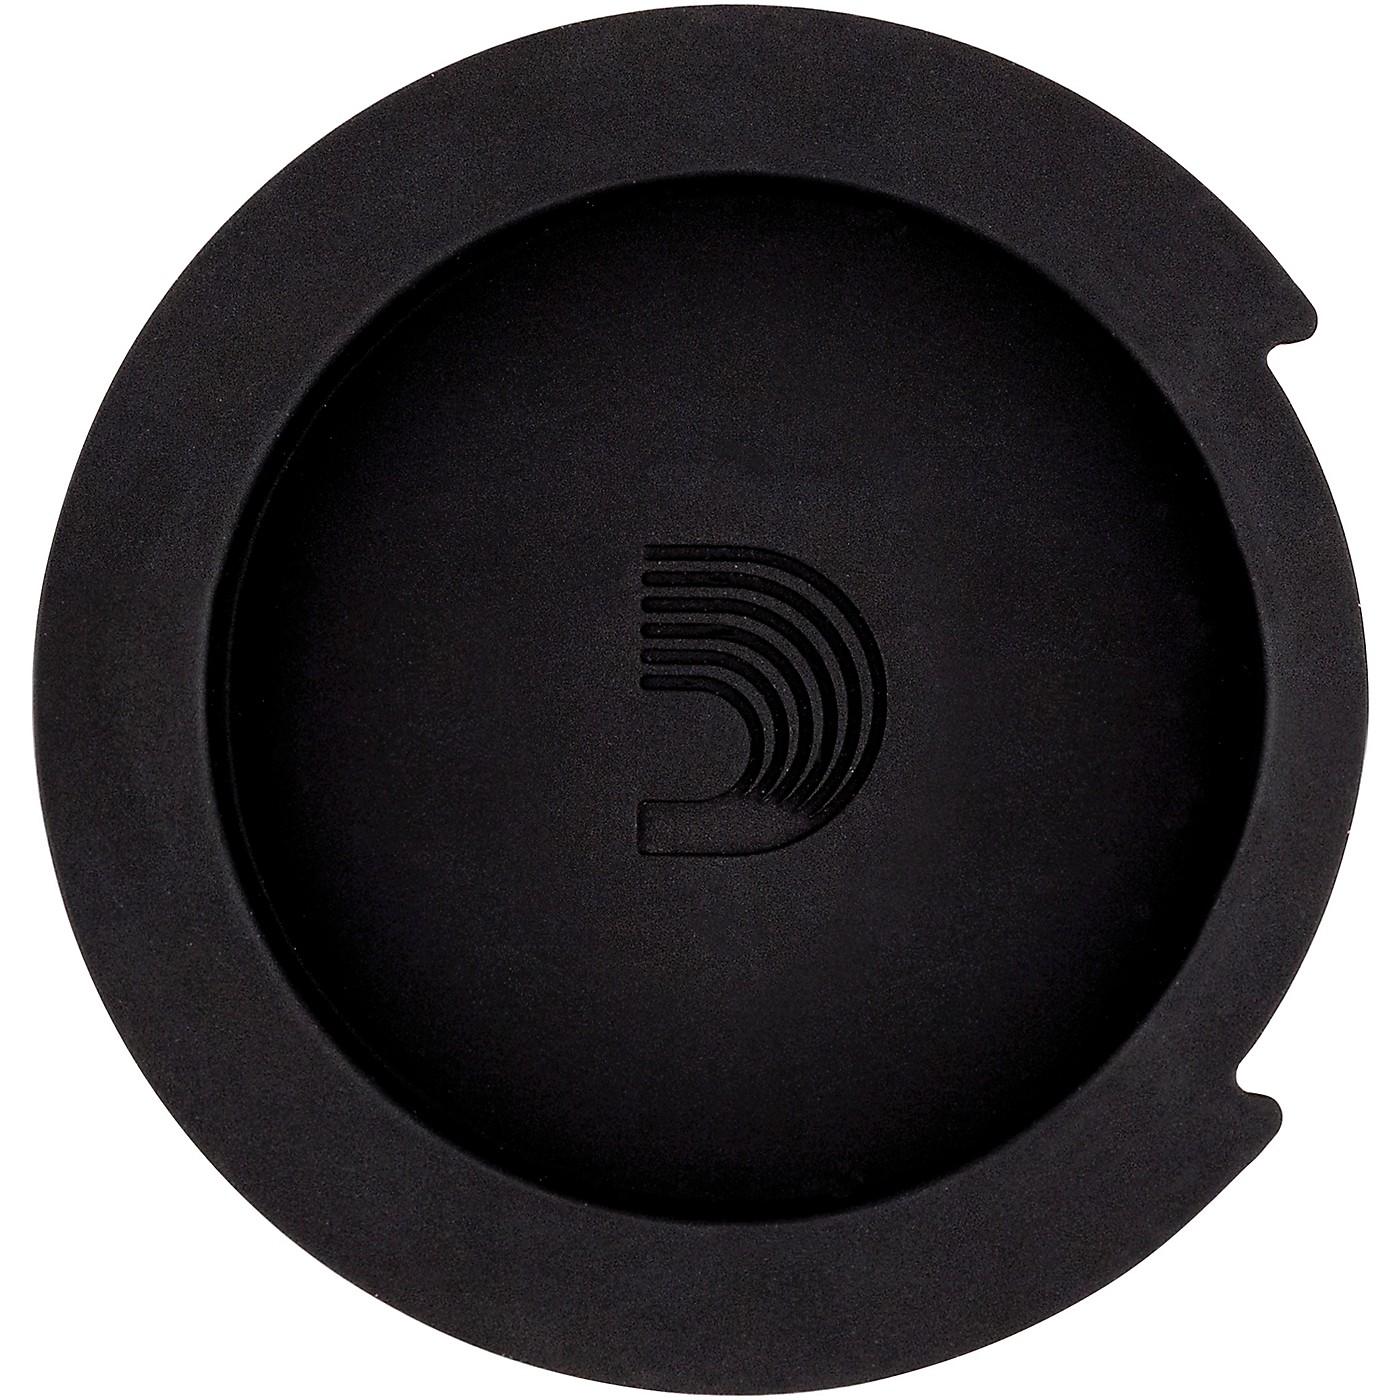 D'Addario Planet Waves Screaching Halt Guitar Soundhole Plug thumbnail